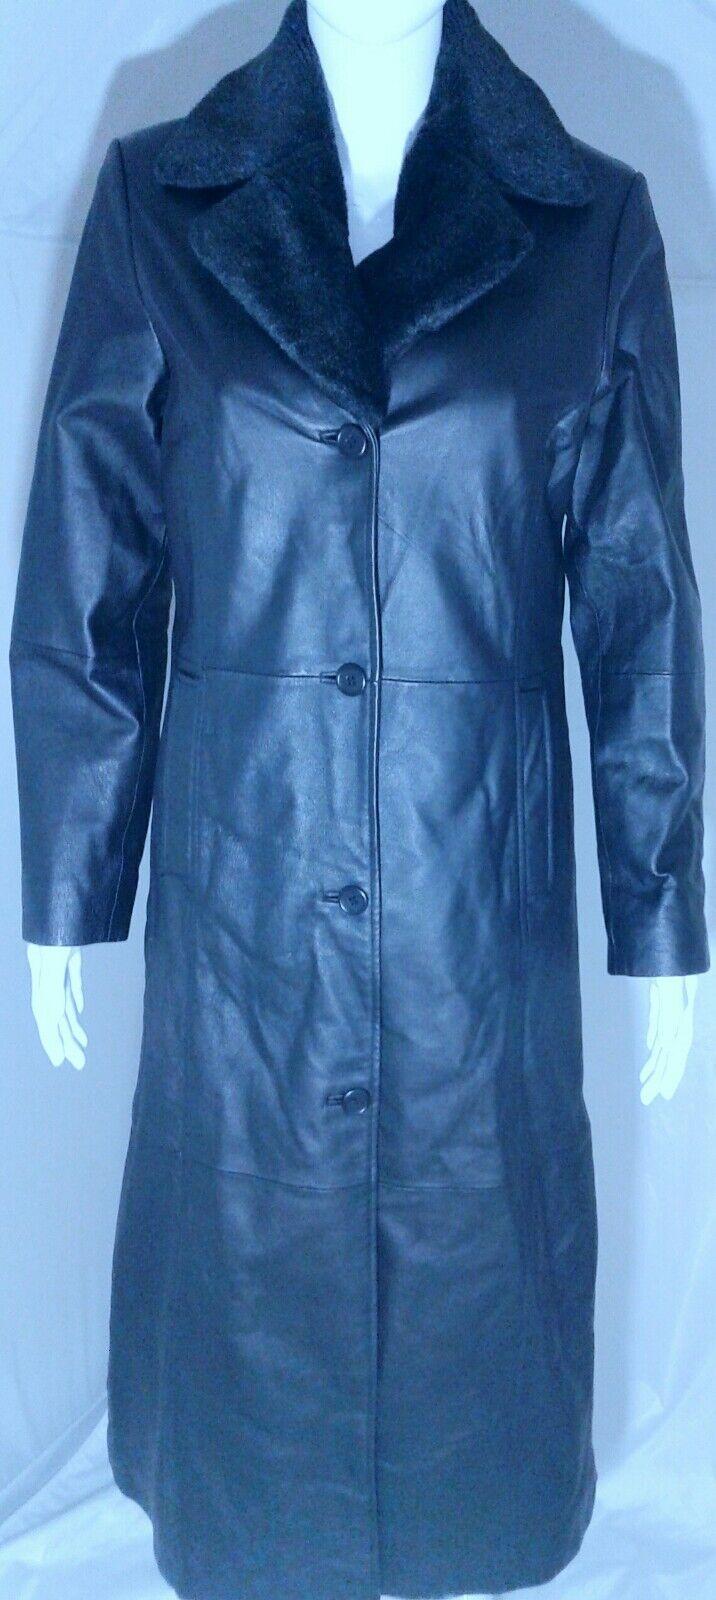 TCM Womens Leather Trench Coat Size 6 Classic Full Full Full Length Leather Coat 291273